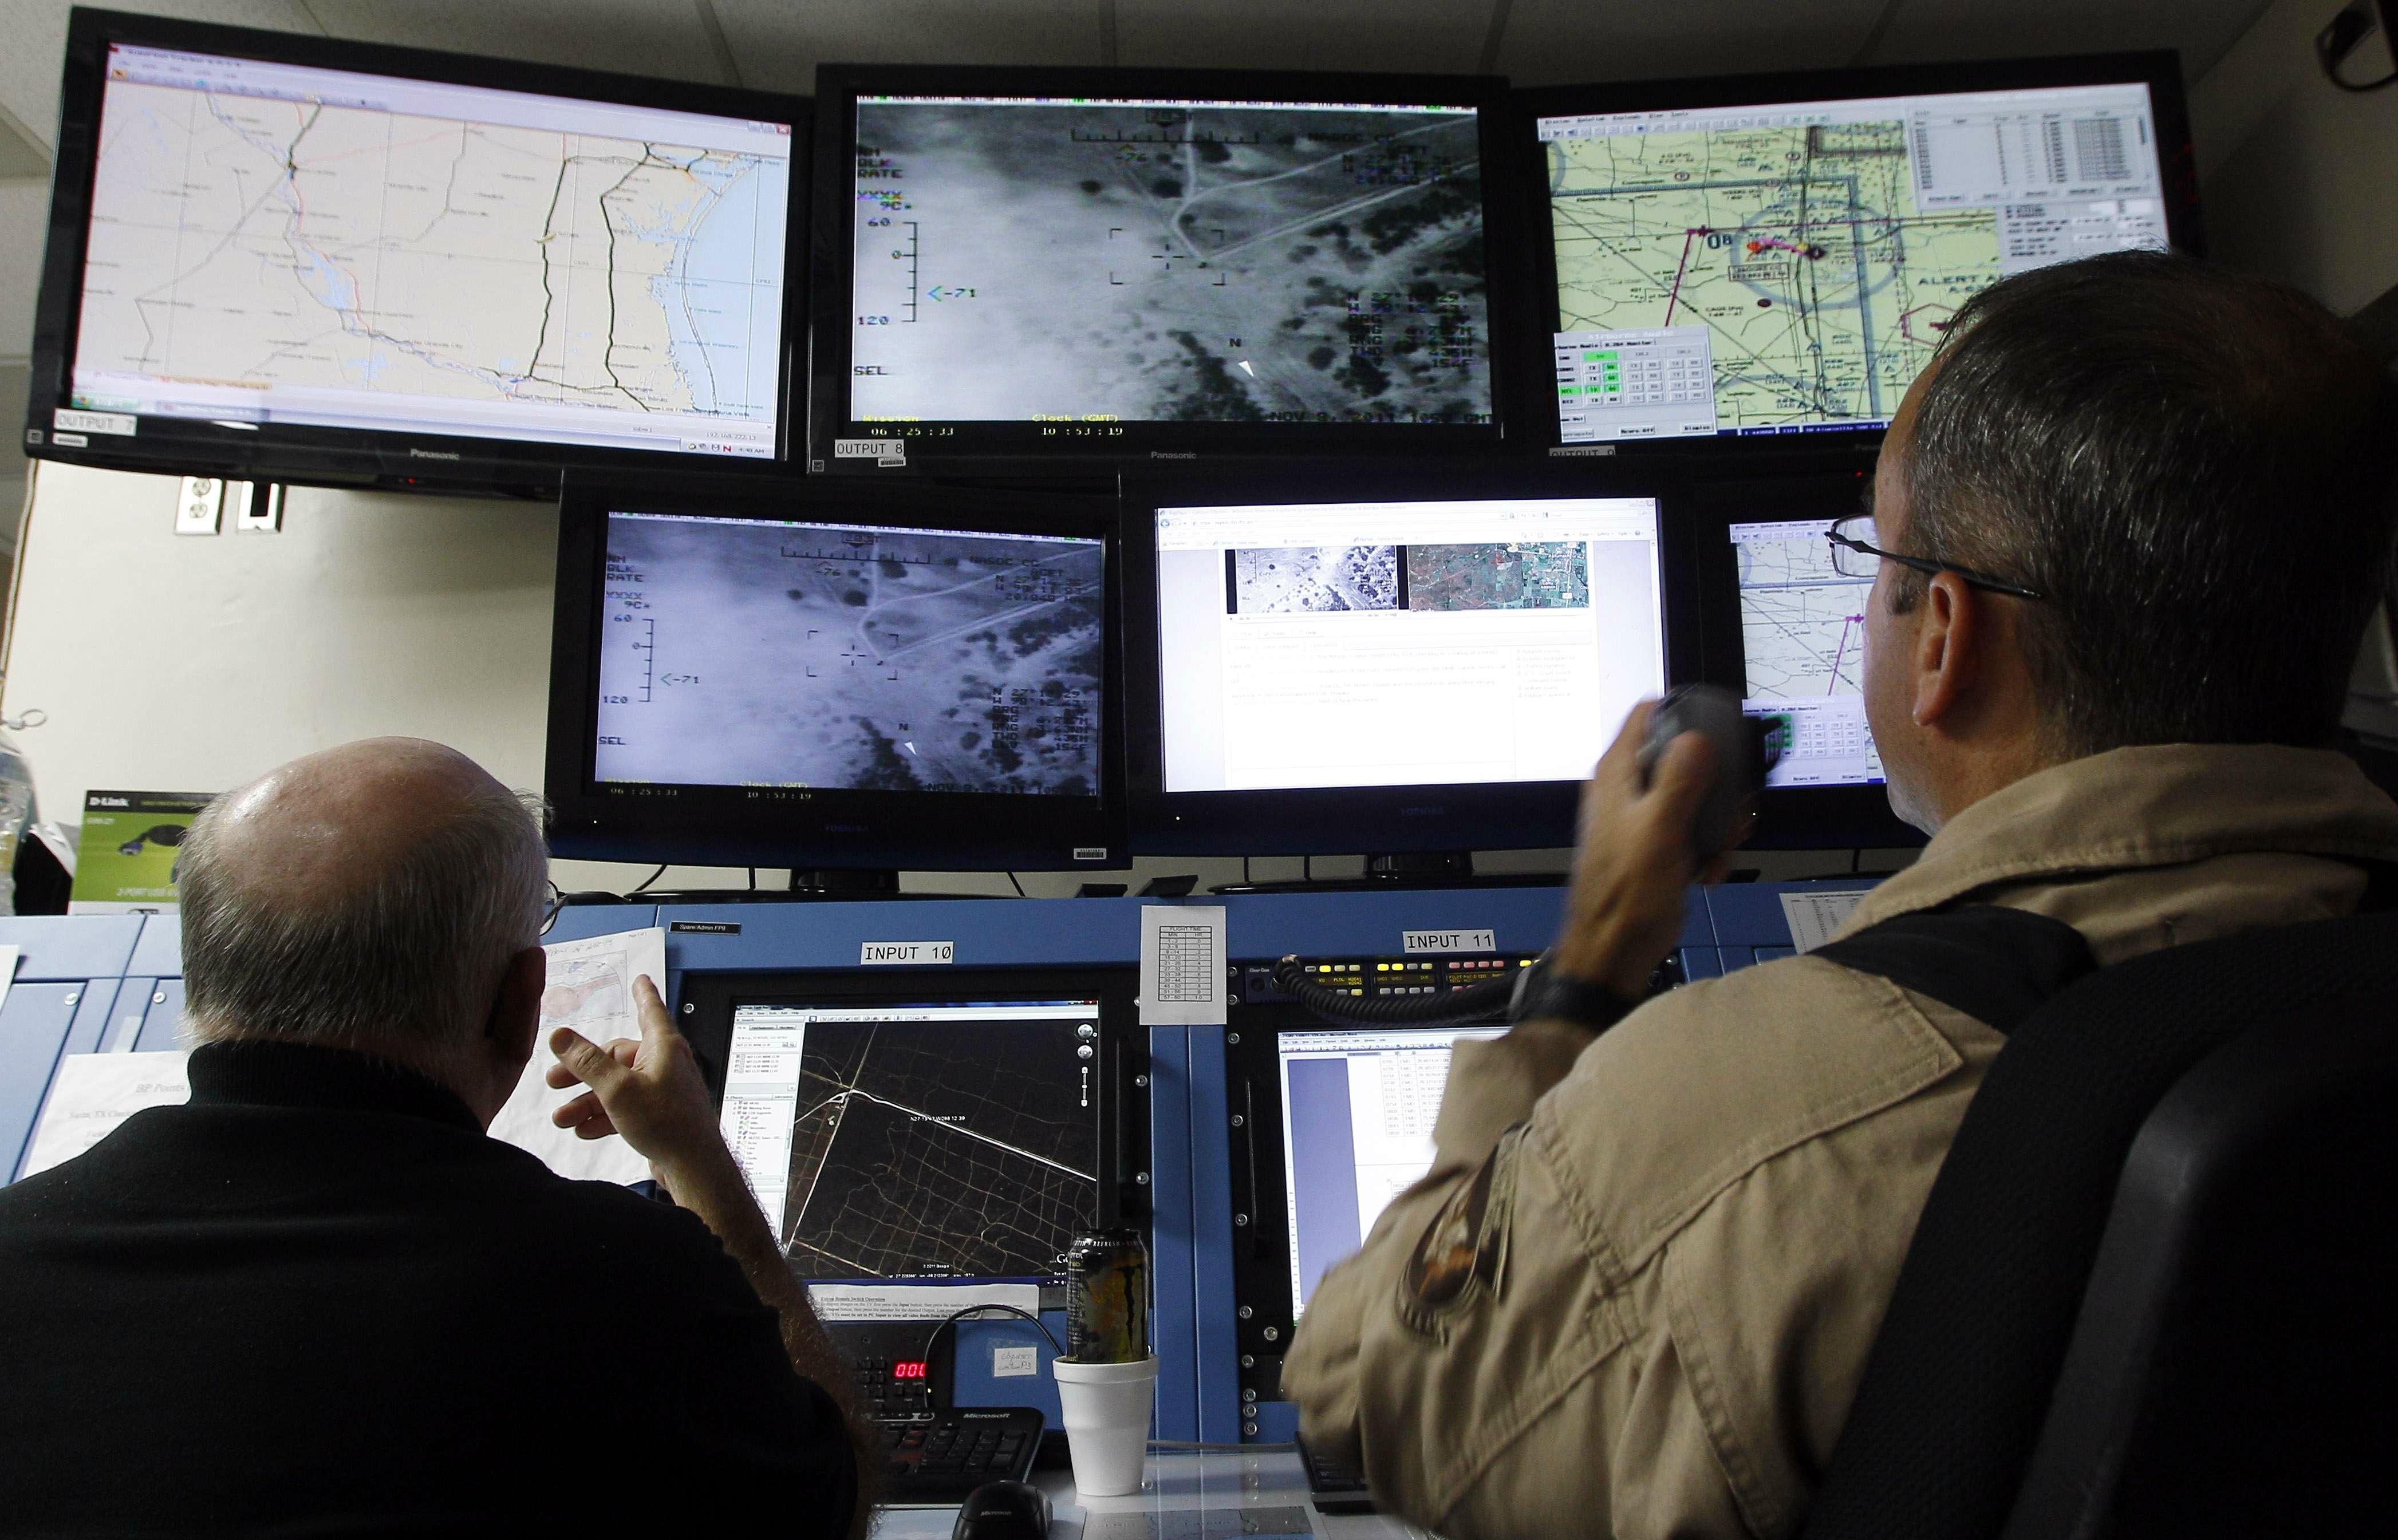 drones-amerique-surveillance-vie-privee.jpg